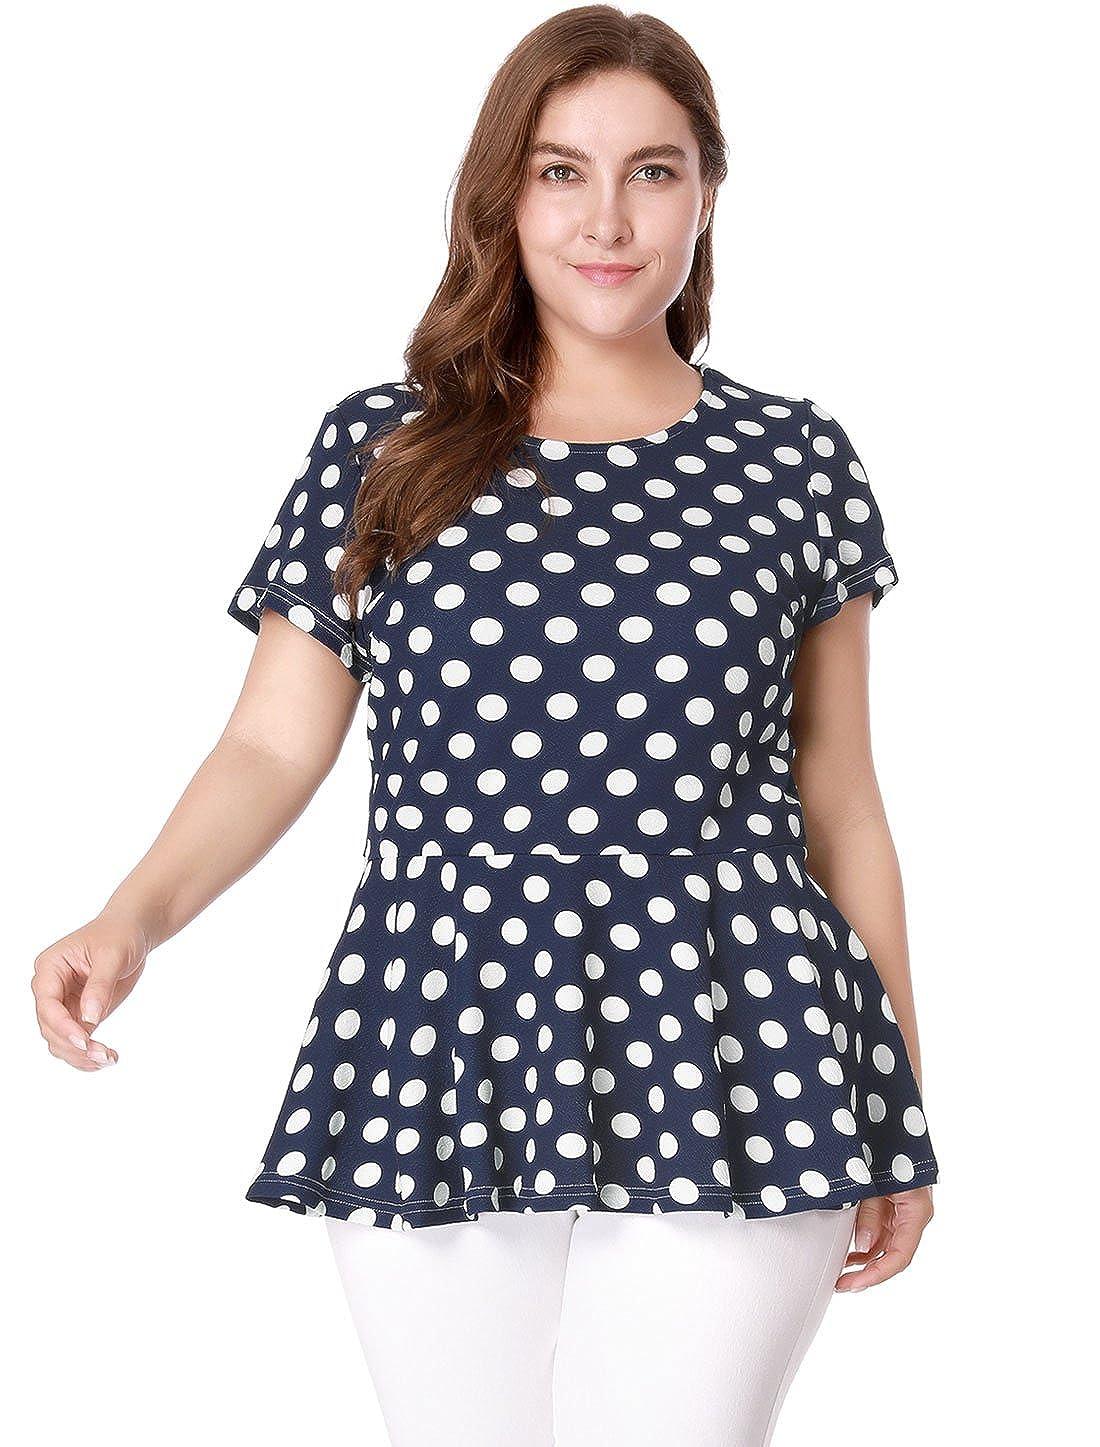 5d2fbb655f32f uxcell Agnes Orinda Women s Plus Size Polka Dot Short Sleeve Summer Peplum  Top  Amazon.co.uk  Clothing